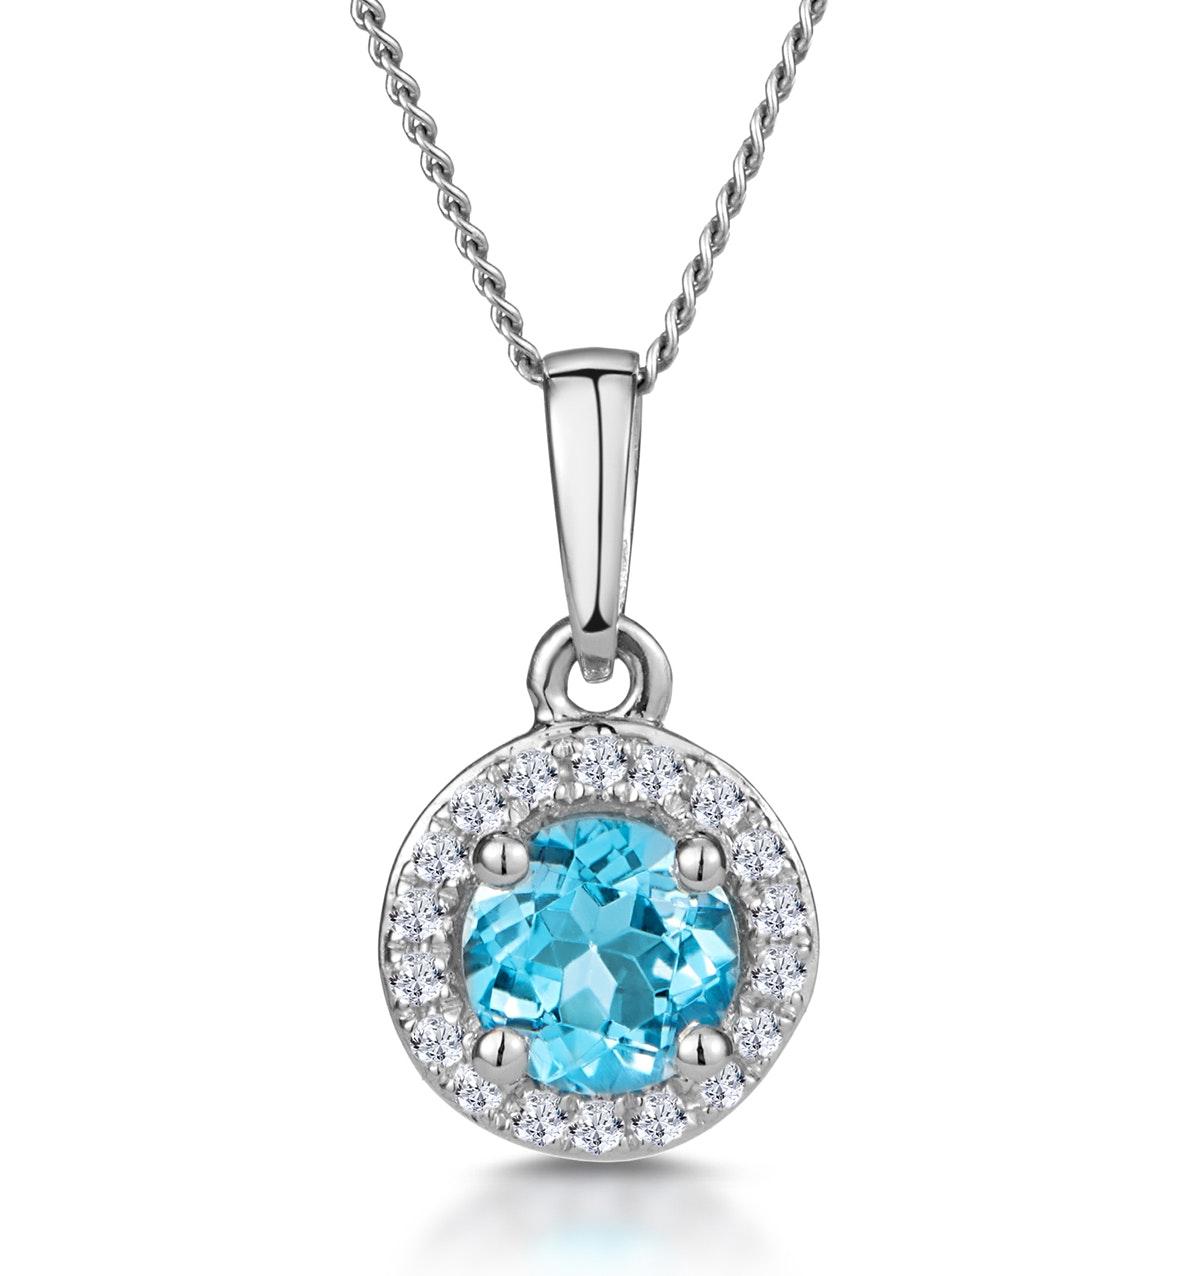 0.37ct Swiss Blue Topaz and Diamond Stellato Necklace in White Gold